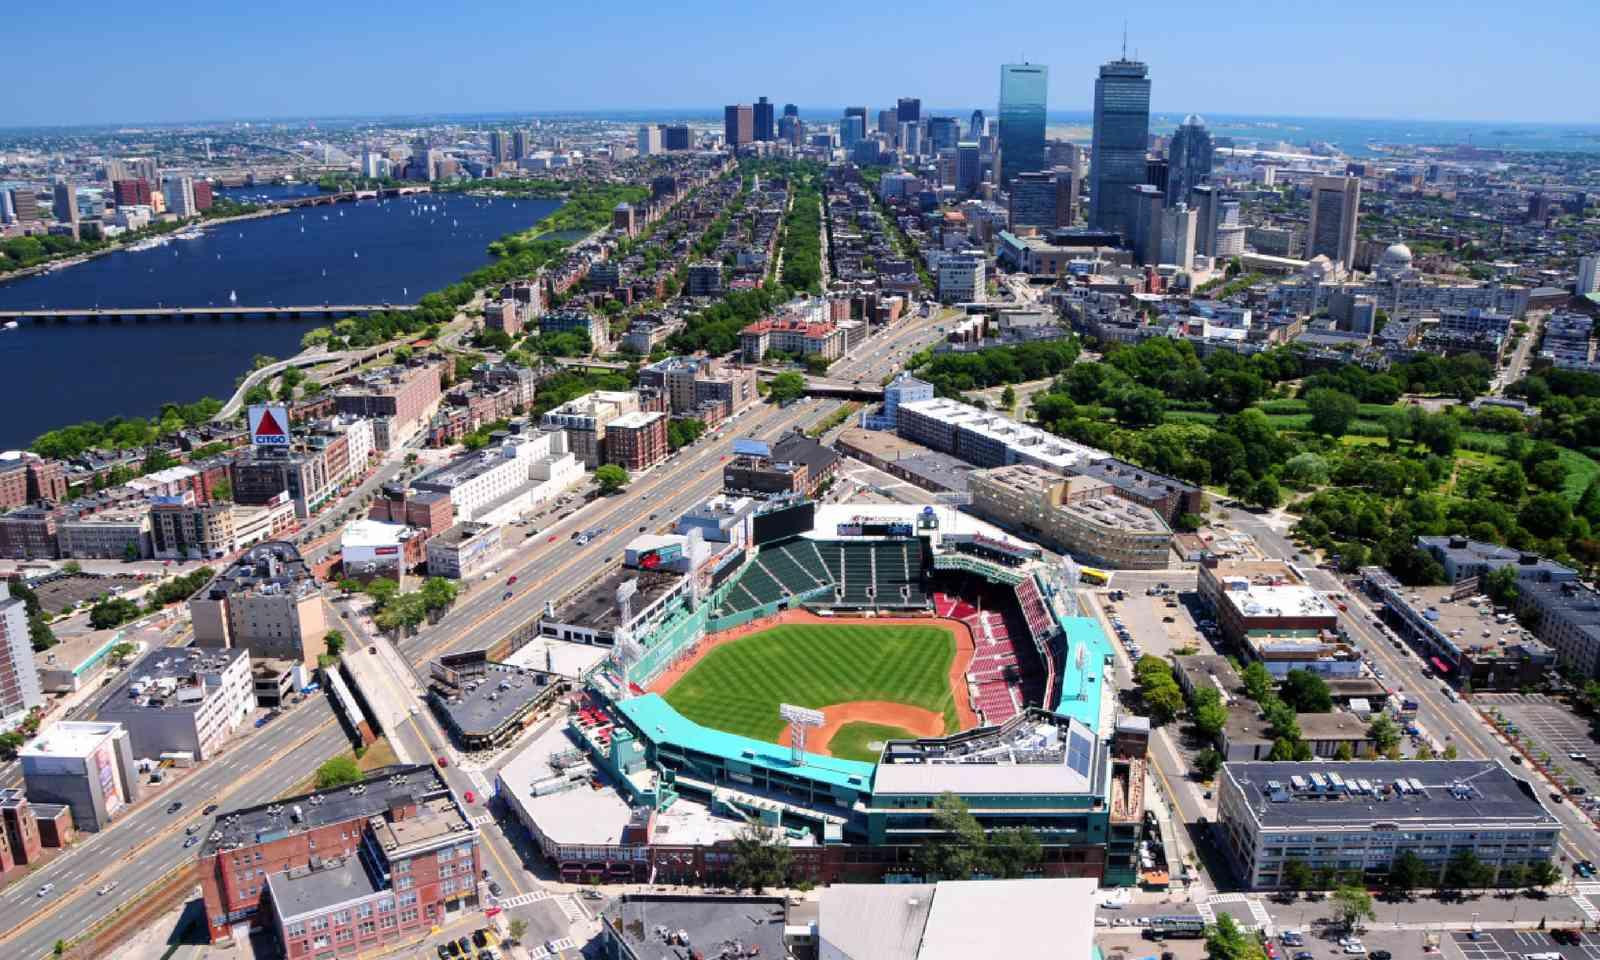 Aerial view of Fenway Park, Boston (Shutterstock)